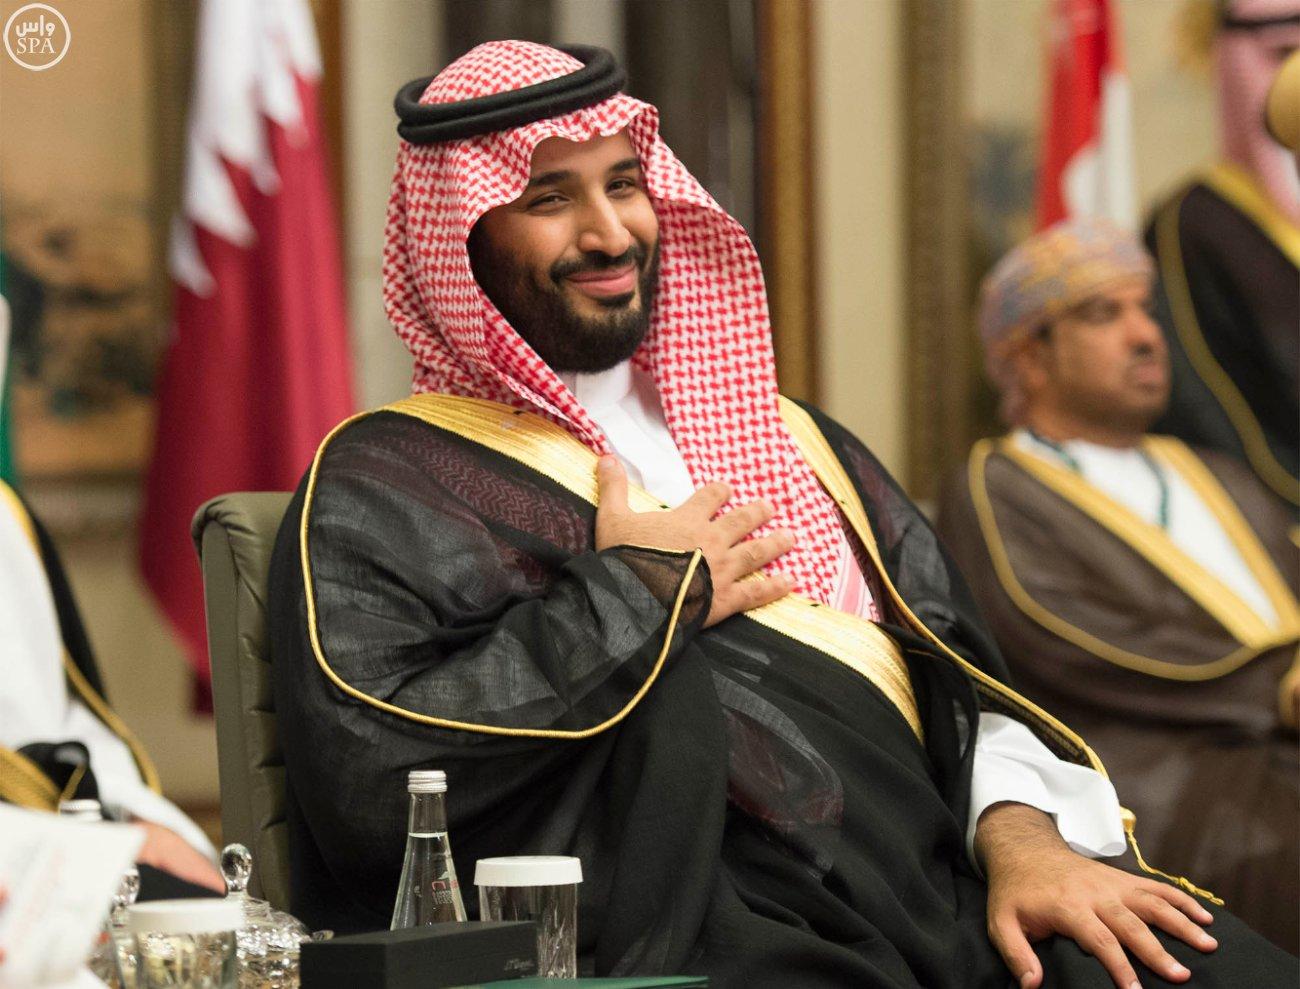 Image result for Saudi Arabia's Deputy Crown Prince Mohammed bin Salman, photos